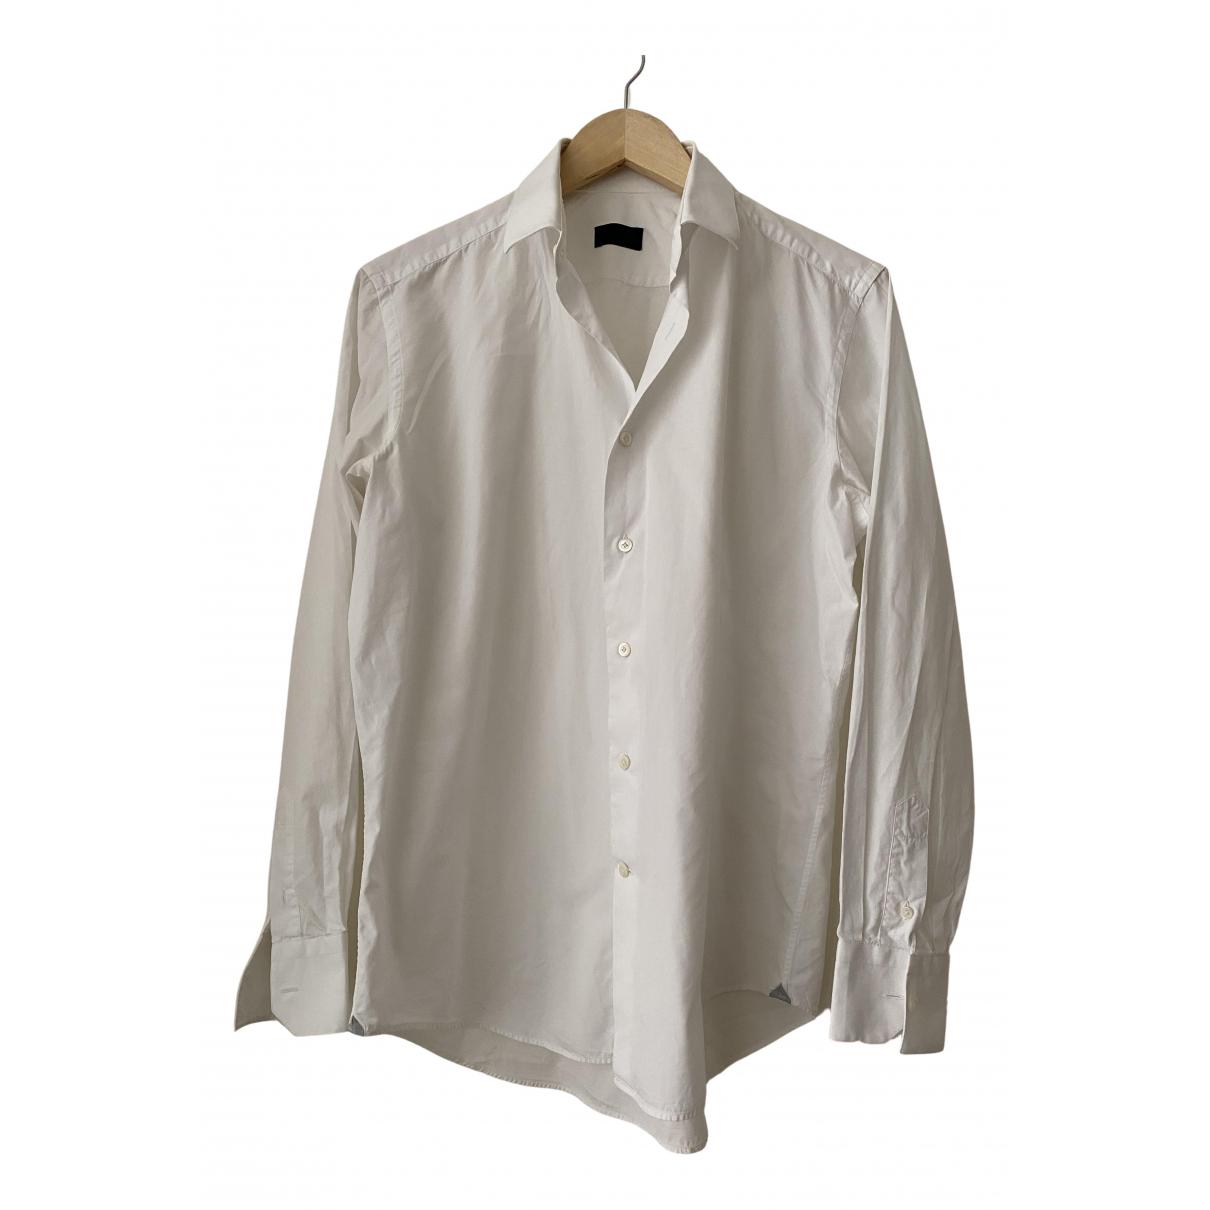 Lanvin N White Cotton Shirts for Men 40 EU (tour de cou / collar)